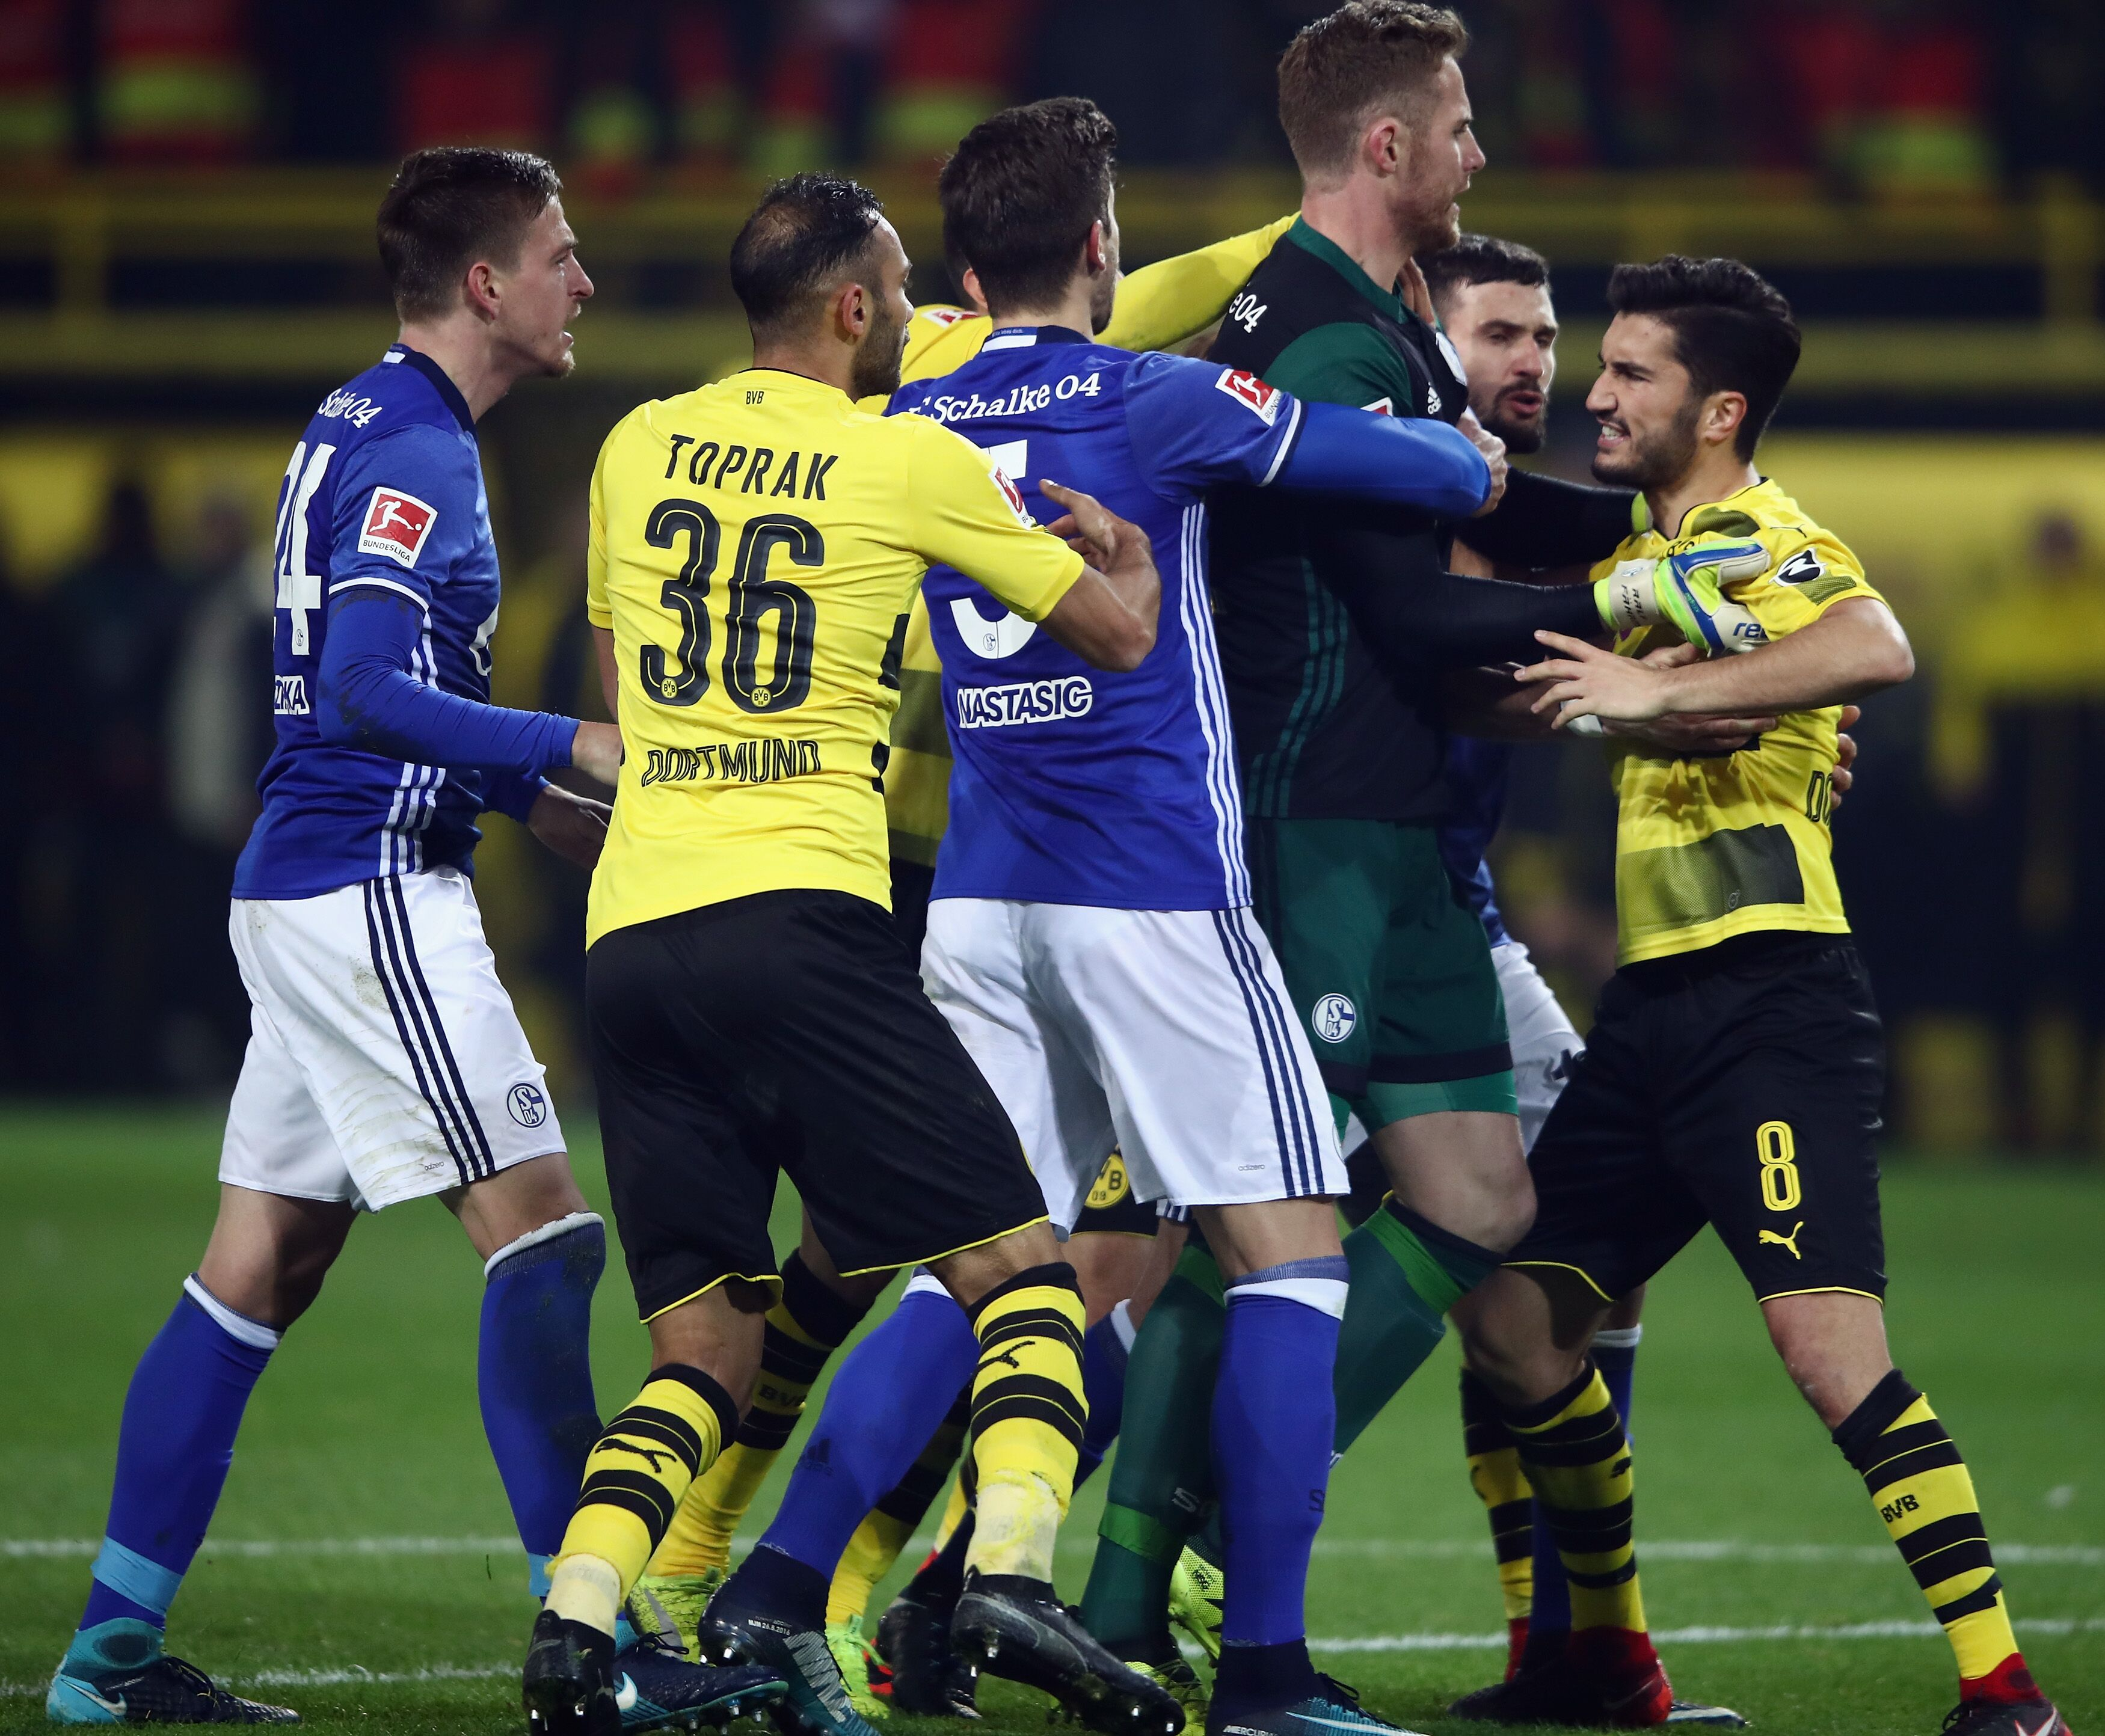 Dortmund Germany November 25 Goalkeeper Ralf Faehrmann Of Schalke And Nuri Sahin Of Dortmund Fight After The Bundesliga Match Between Borussia Dortmund